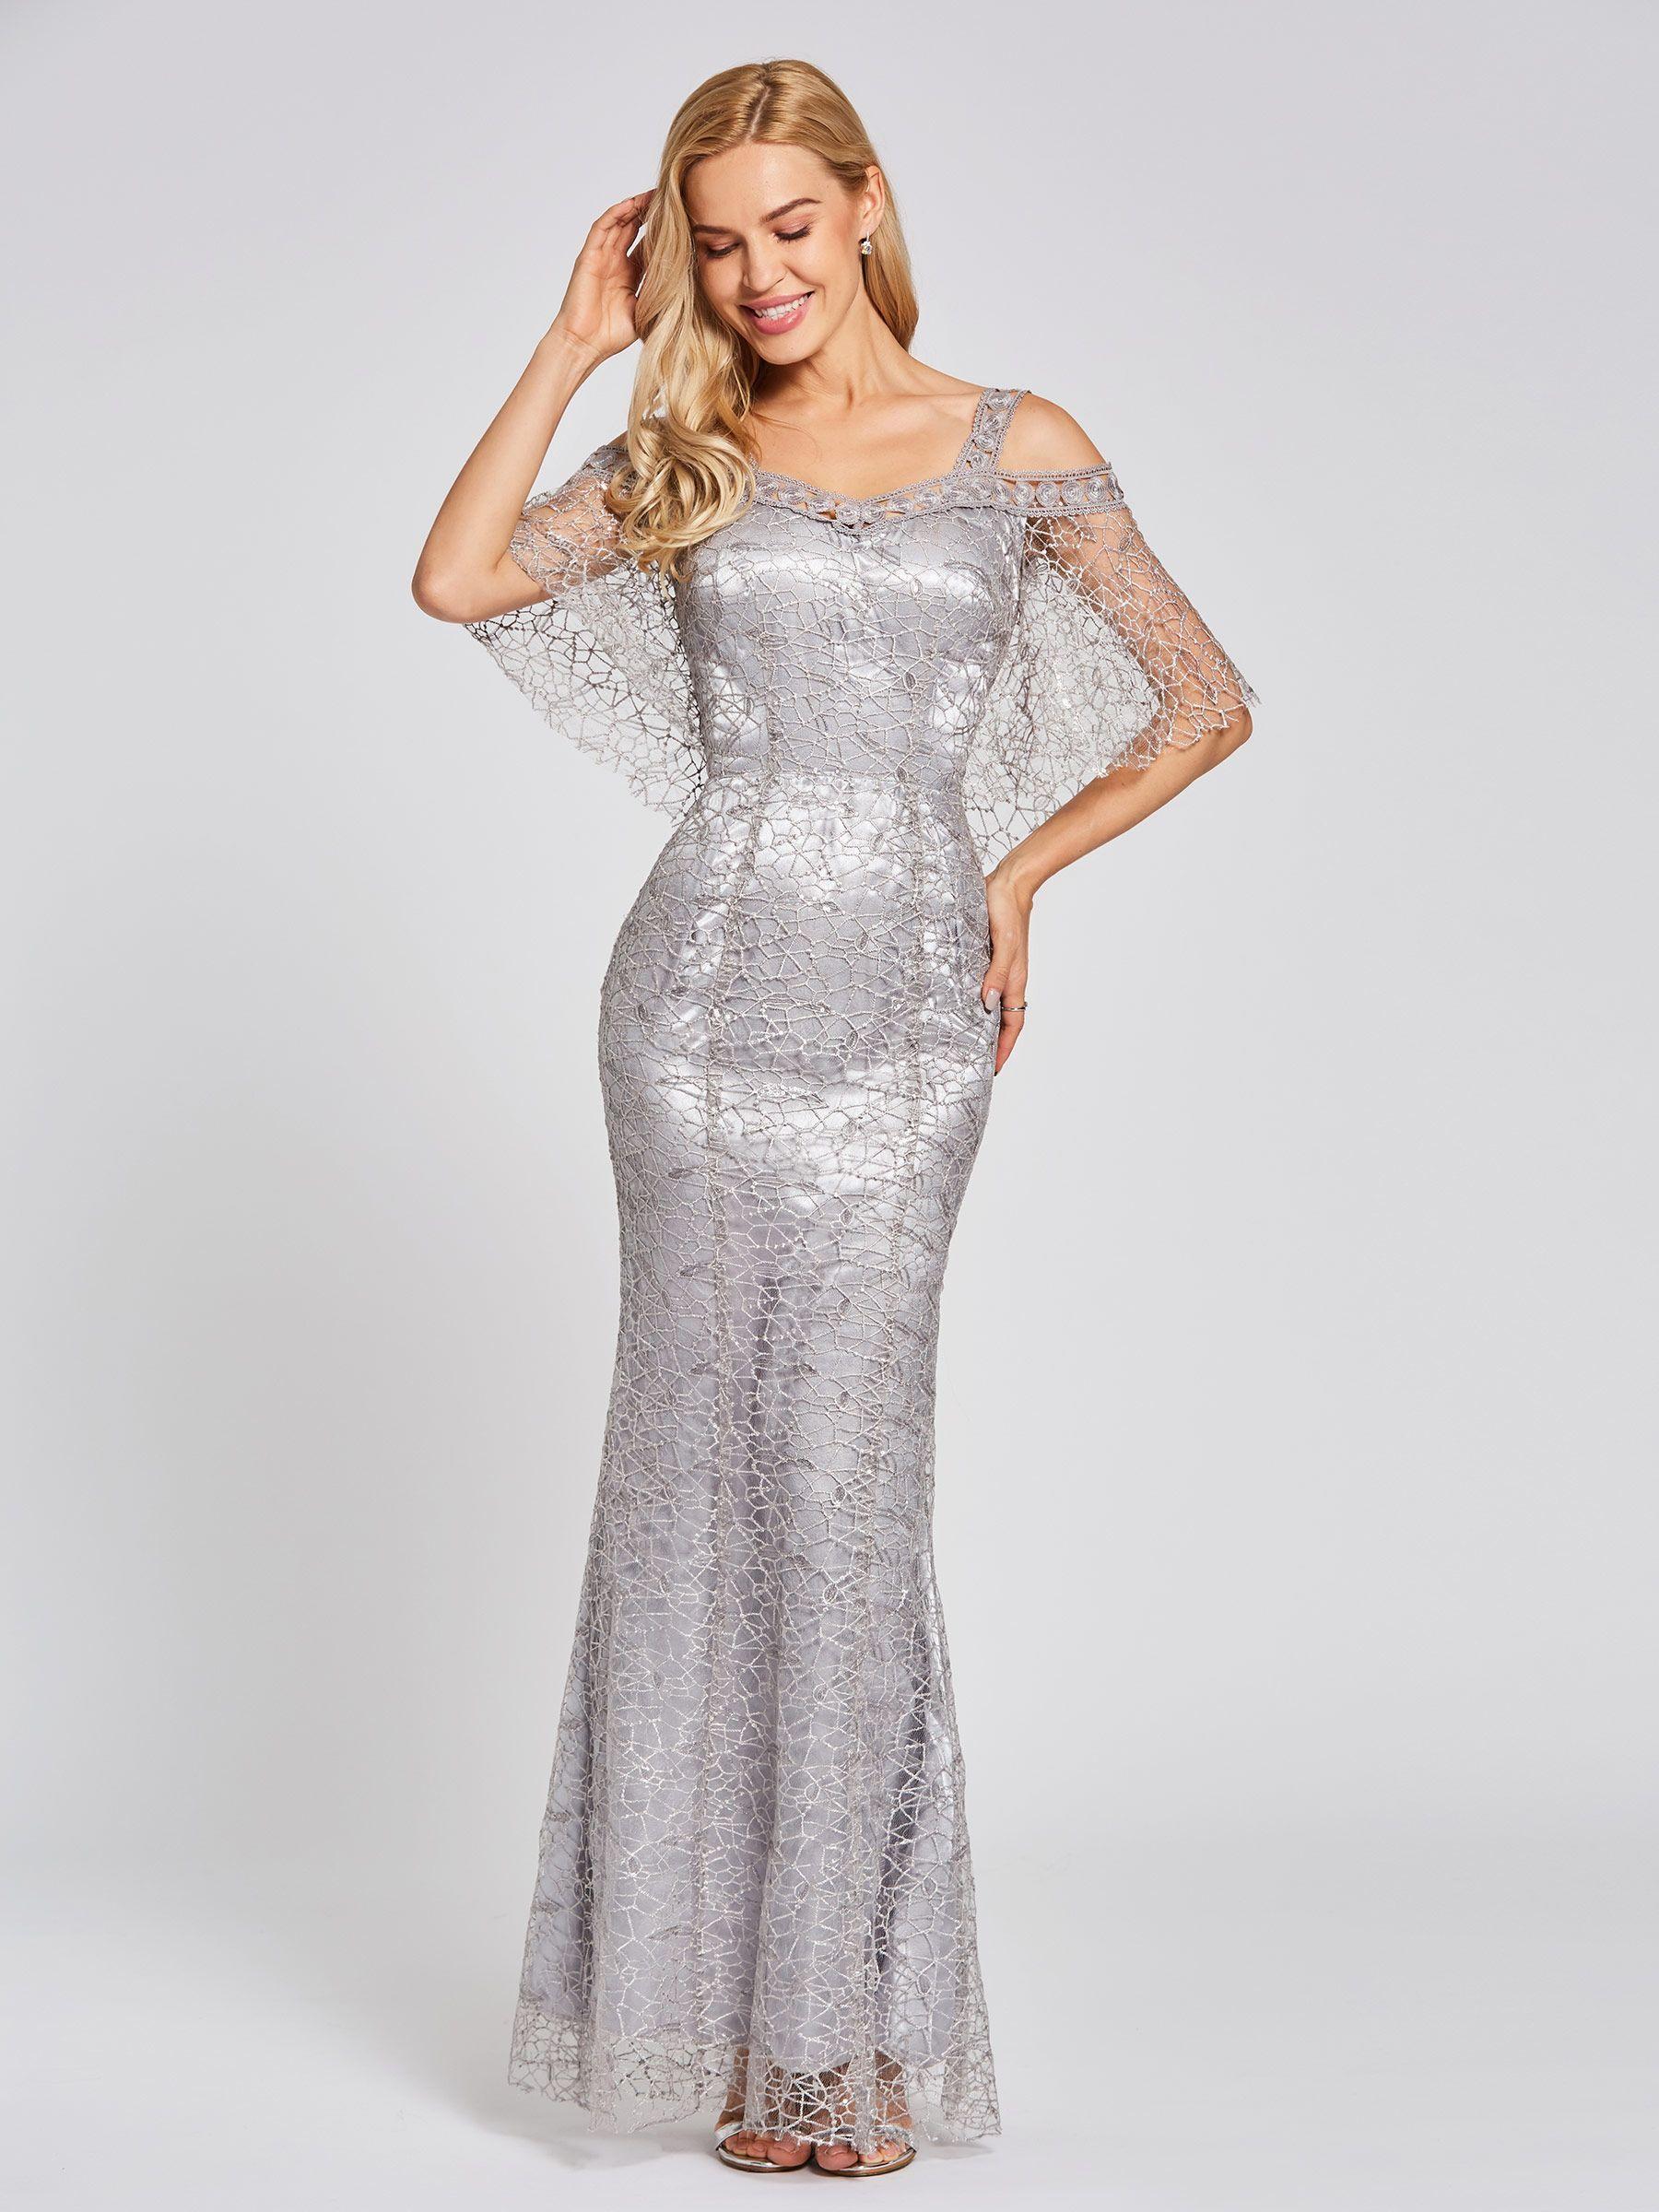 4f5dd74e18990 Straps Lace Trumpet Floor-Length Evening Dress in 2019 | TBdress ...